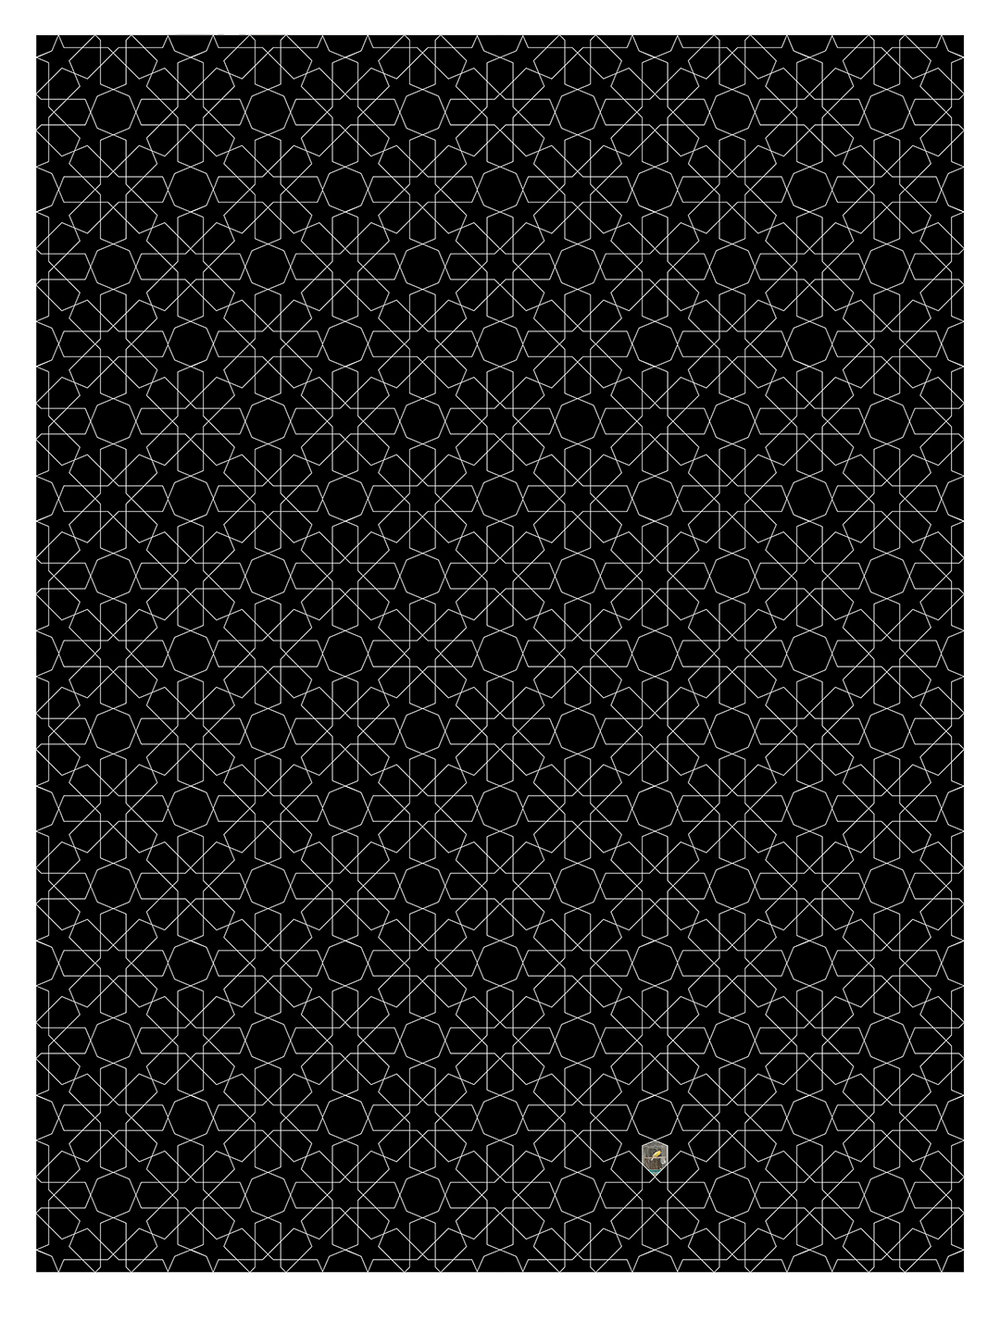 Static 03 (Black)